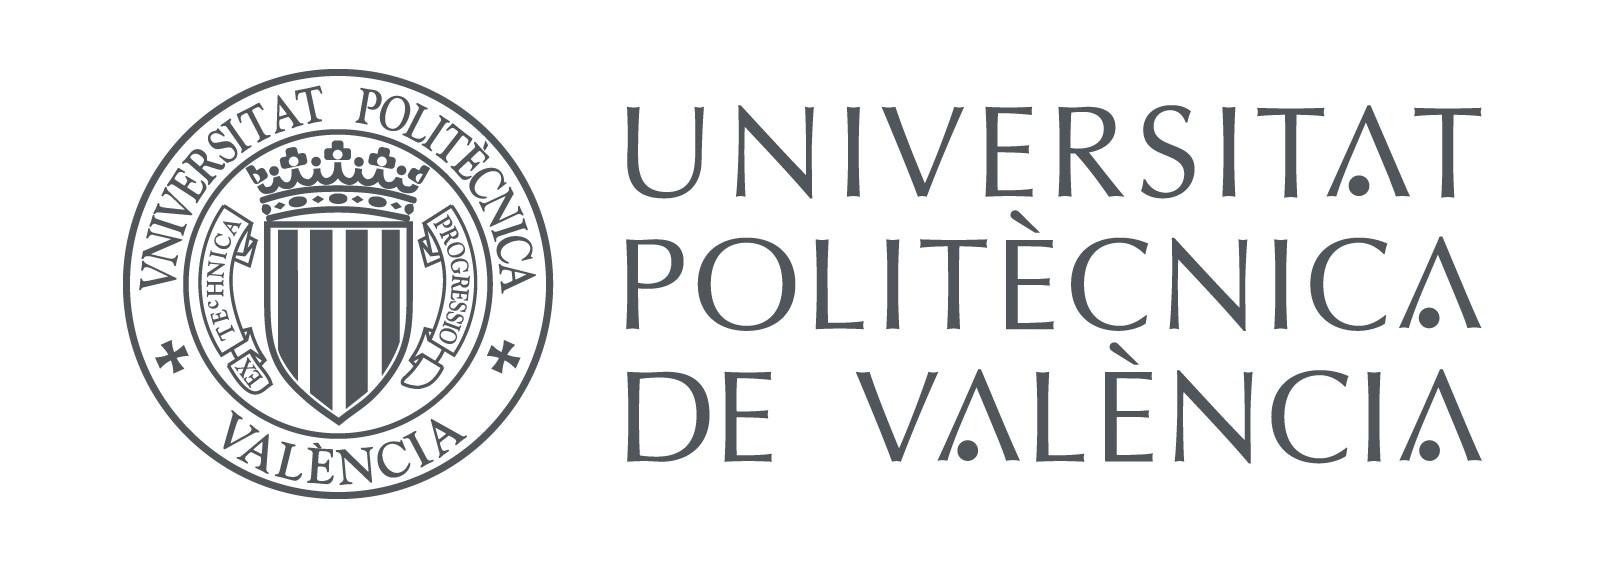 UNIVERSITAT POLITECNICA VALENCIA 1 - Casos de éxito